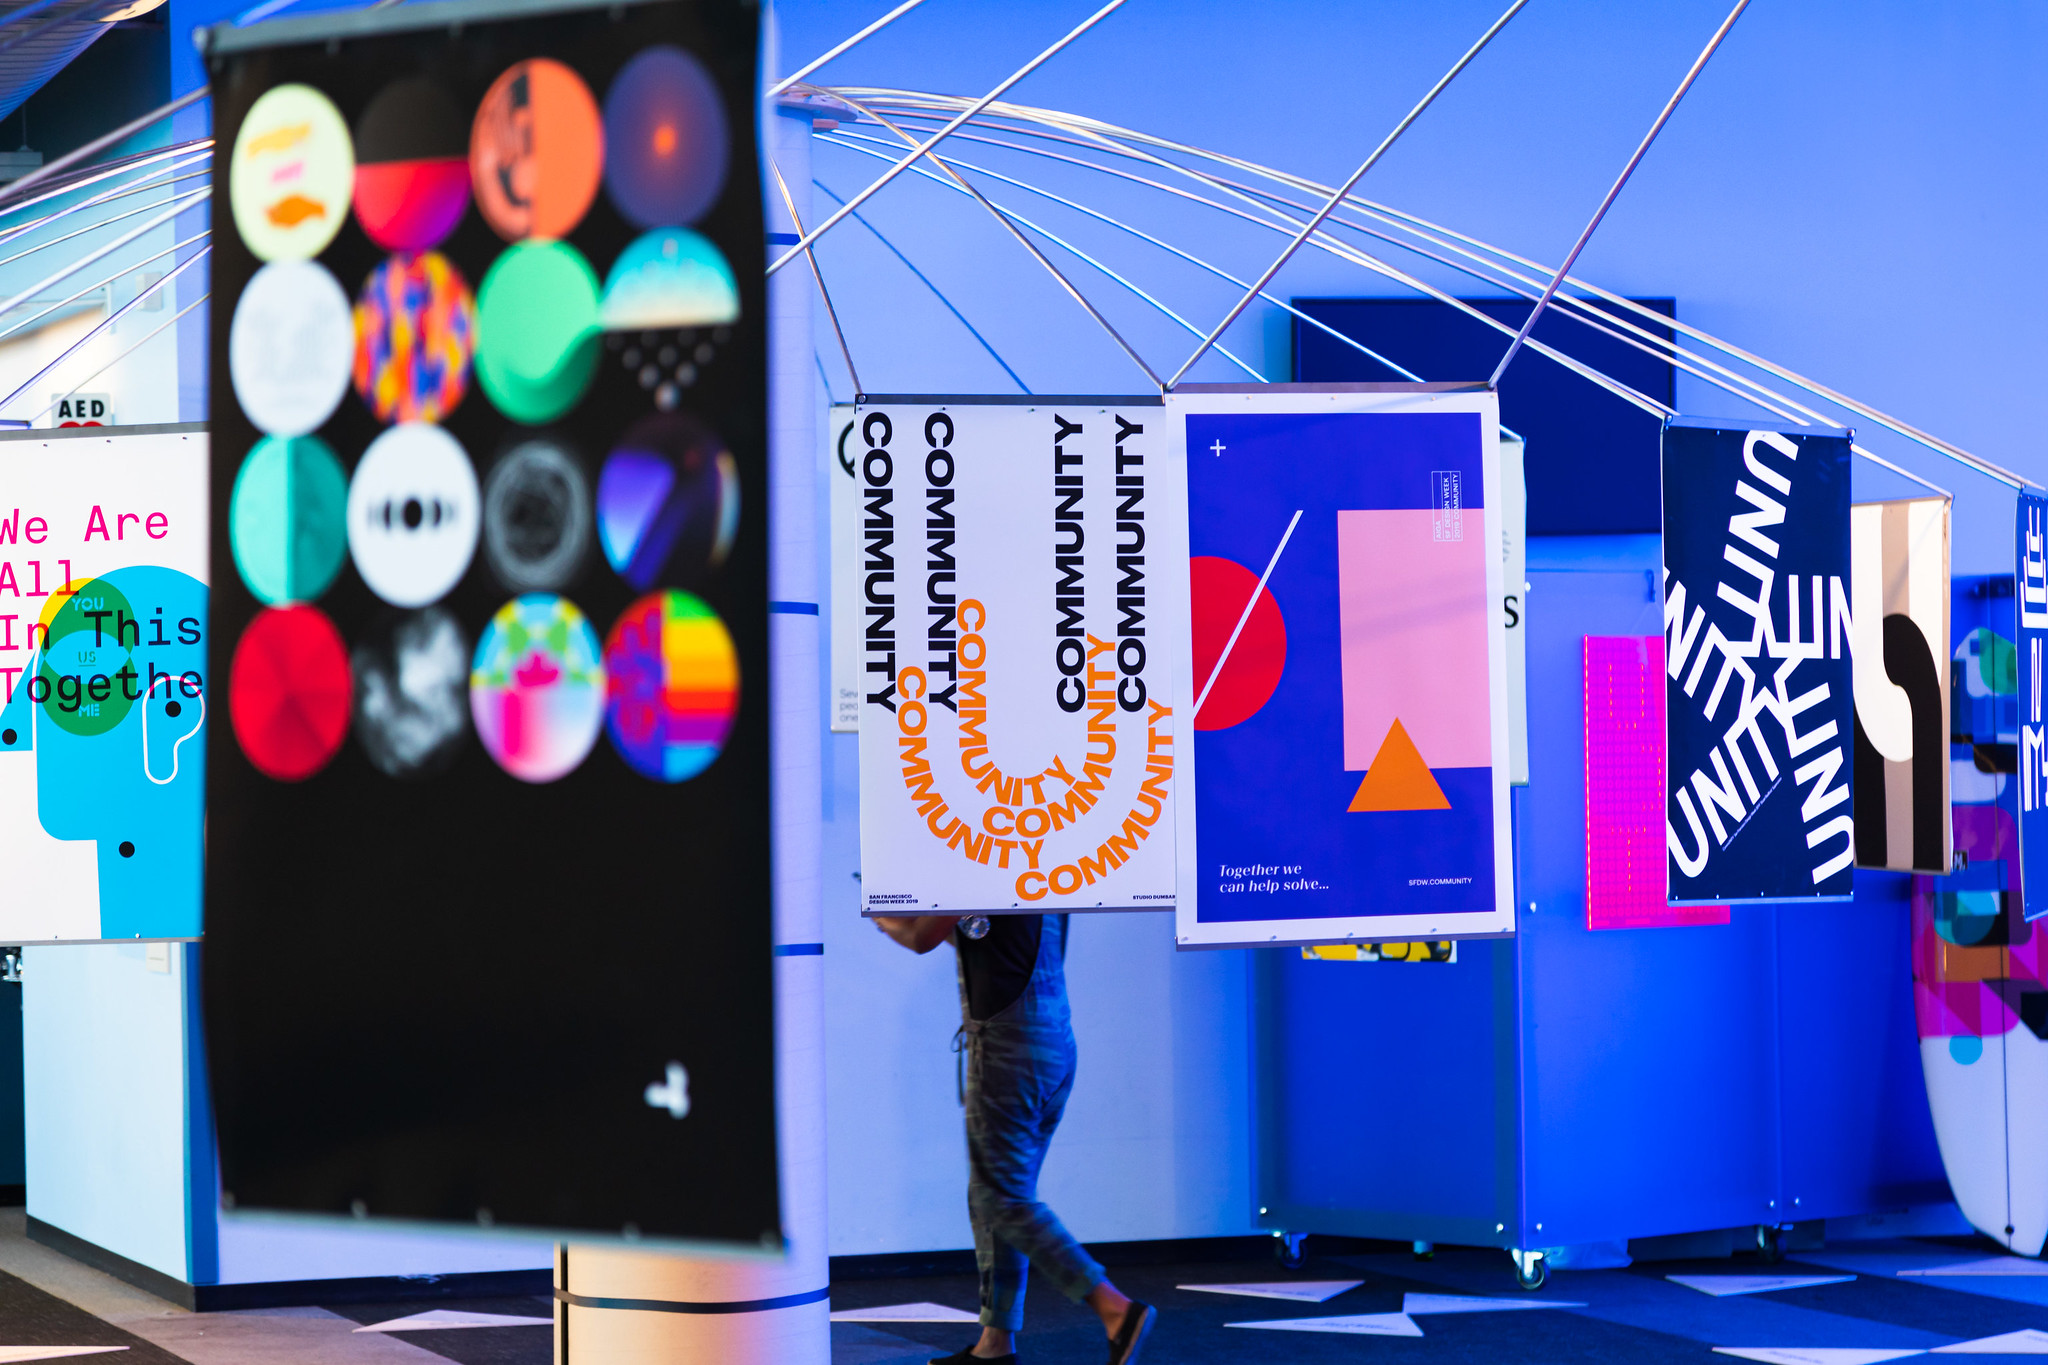 SF Design Week CommUnity exhibition printed by Plotnet Prints